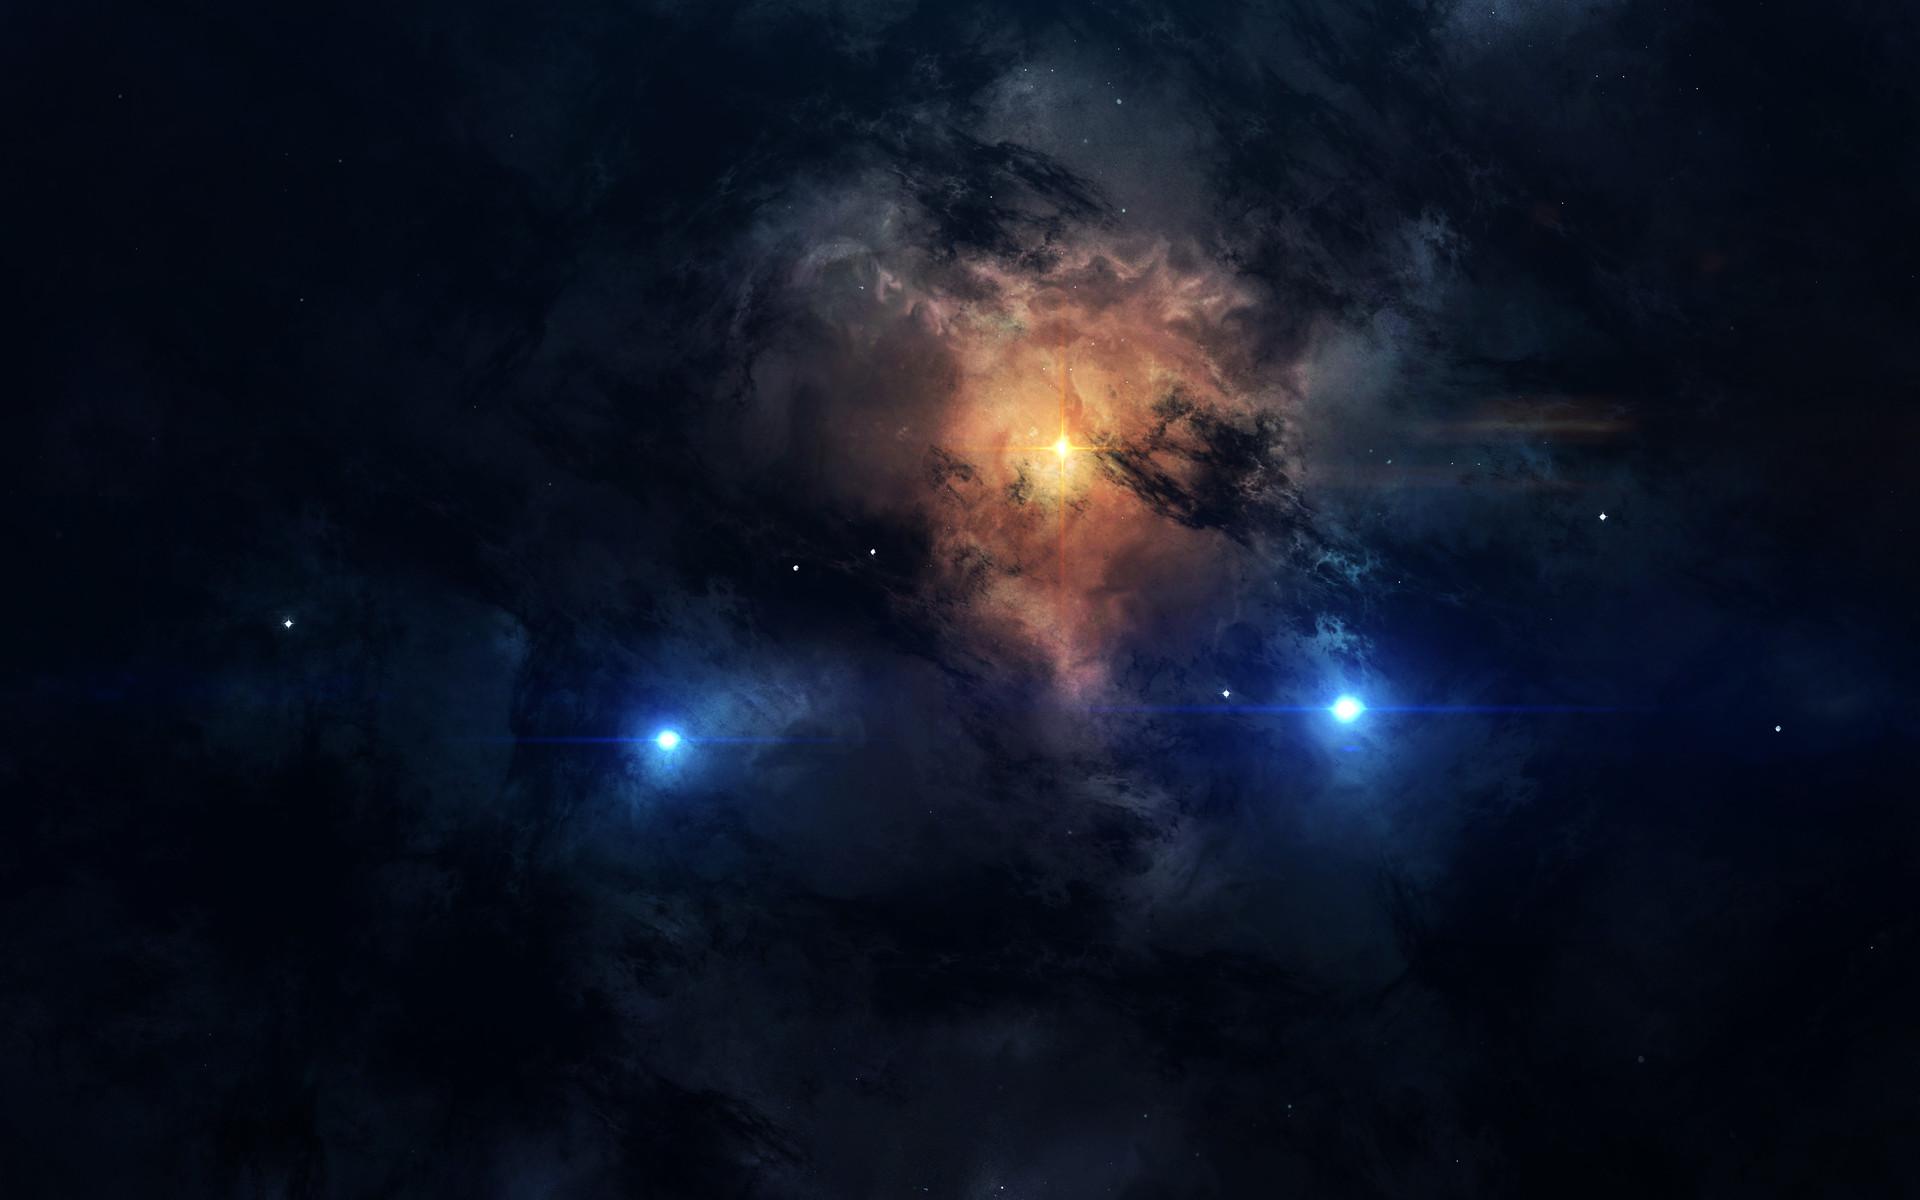 Sci Fi Space 1920x1200